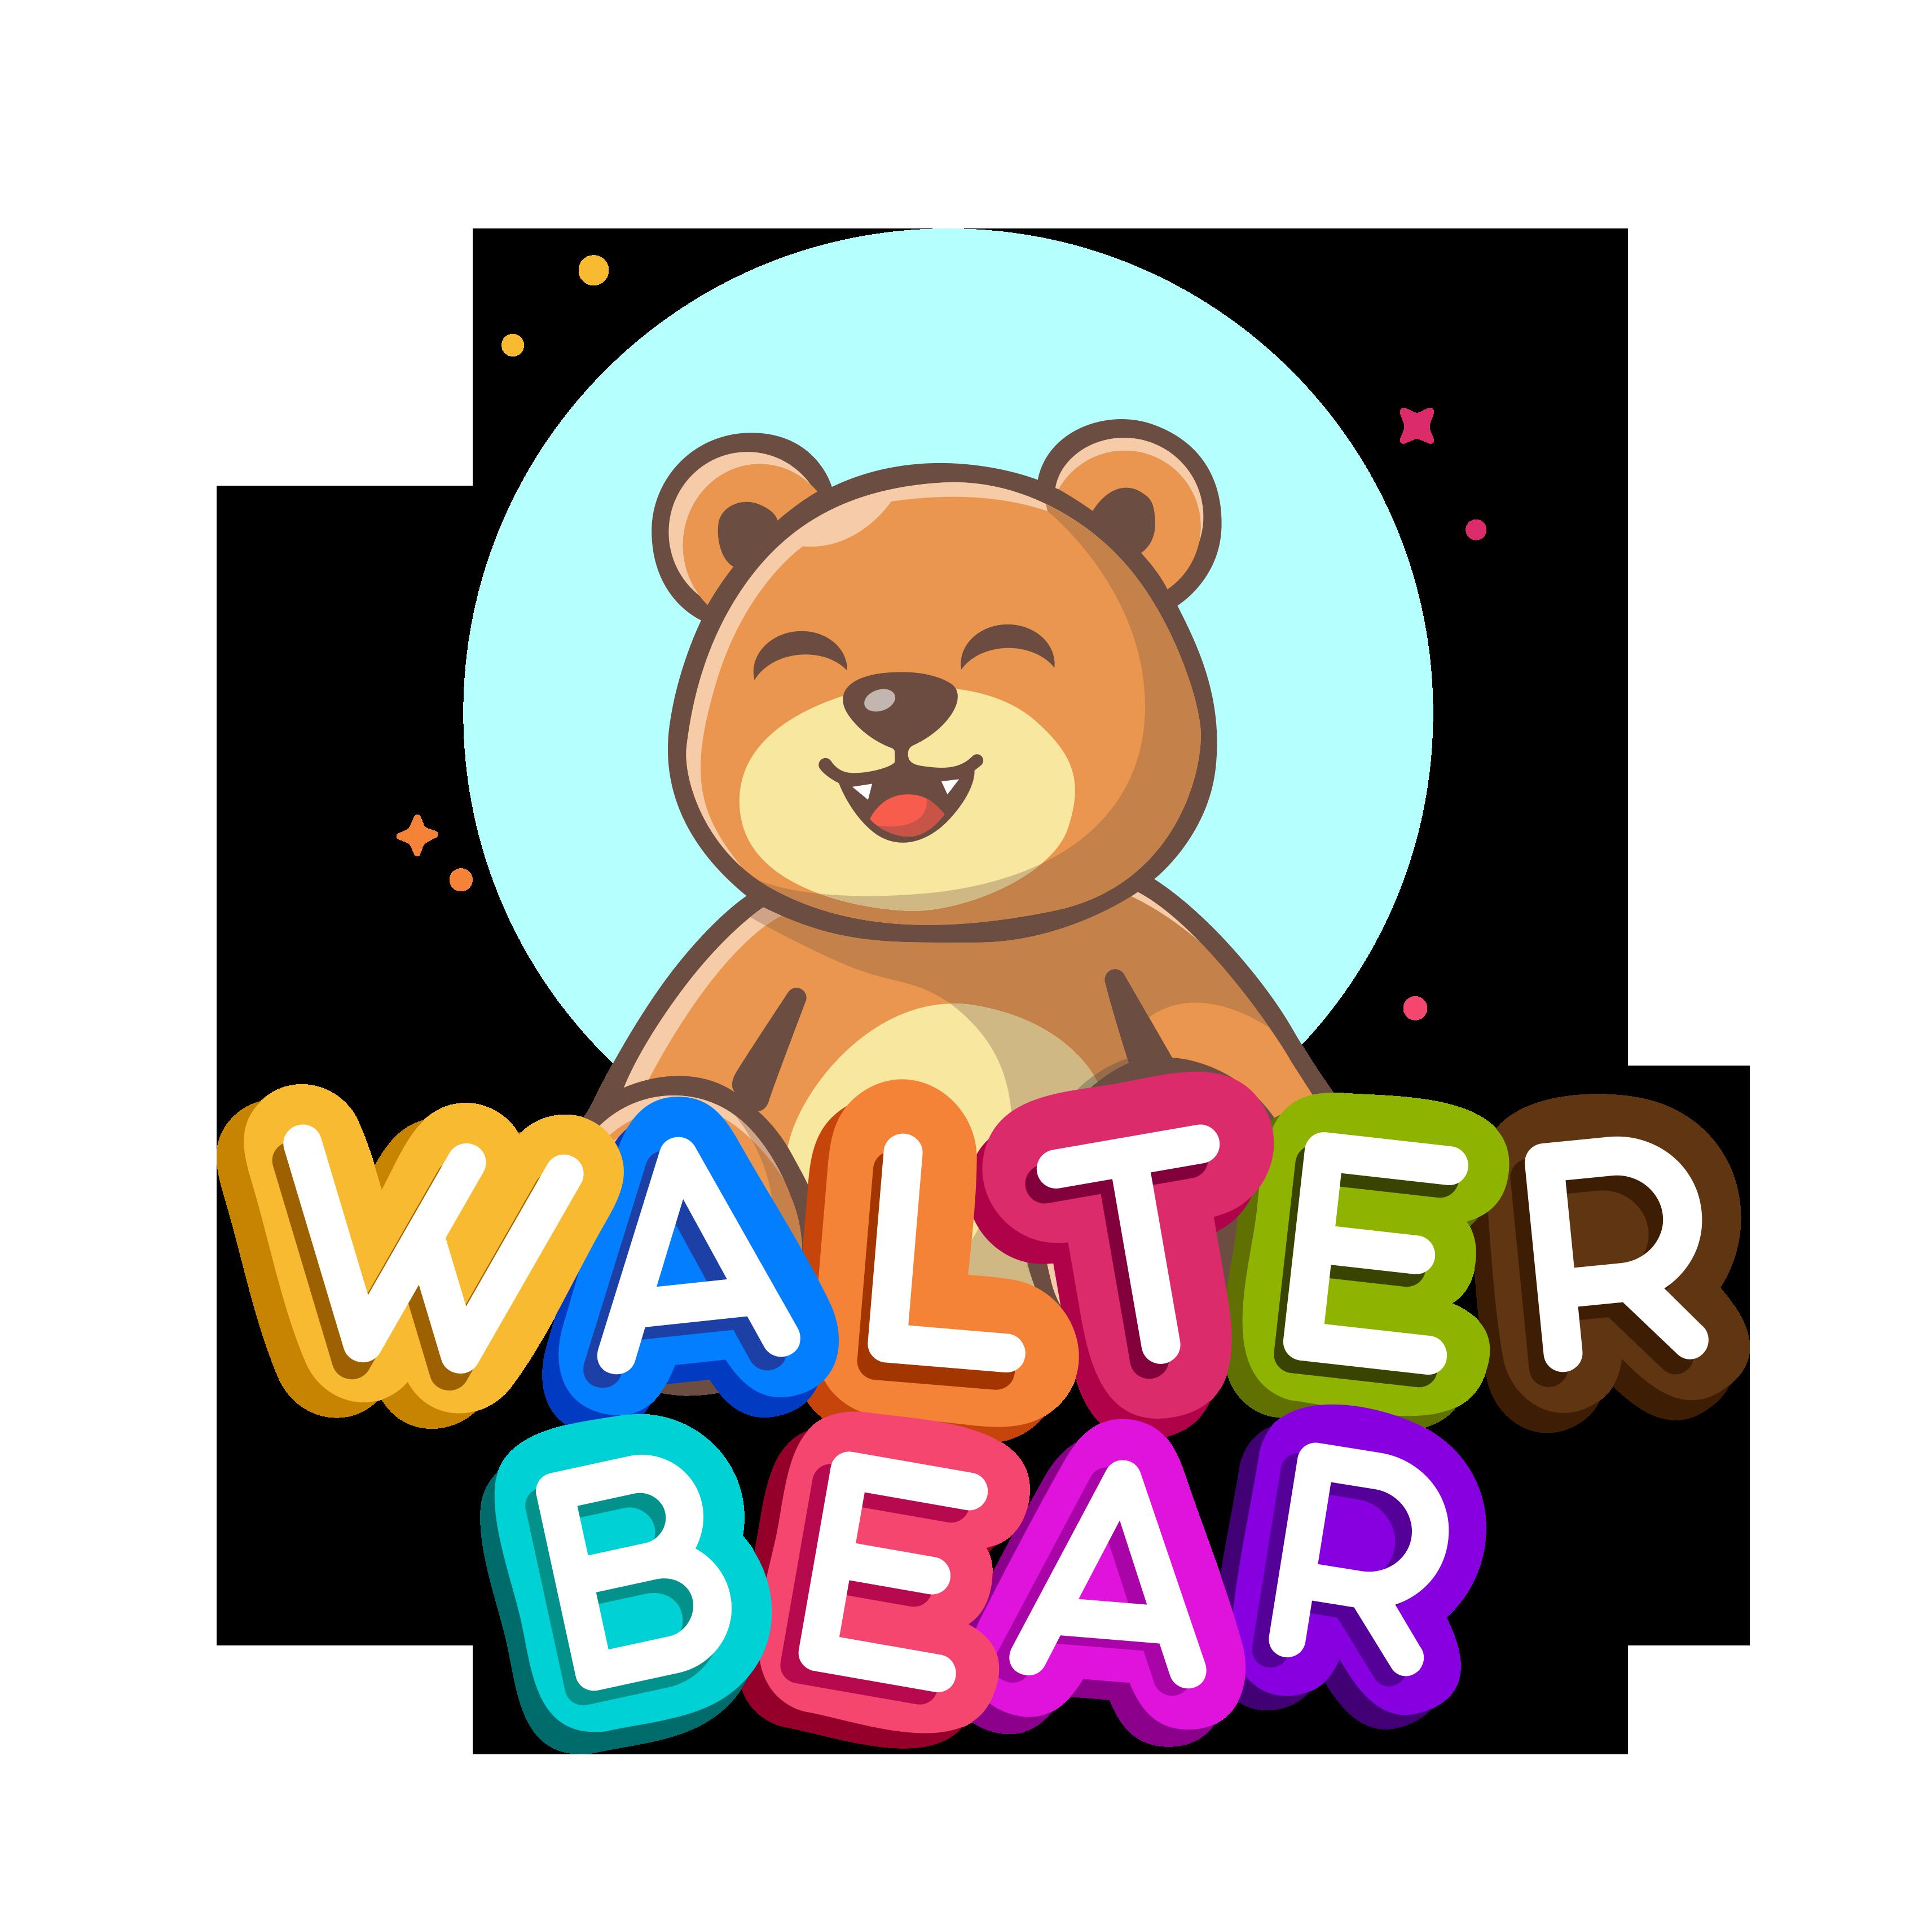 Walter Bear |